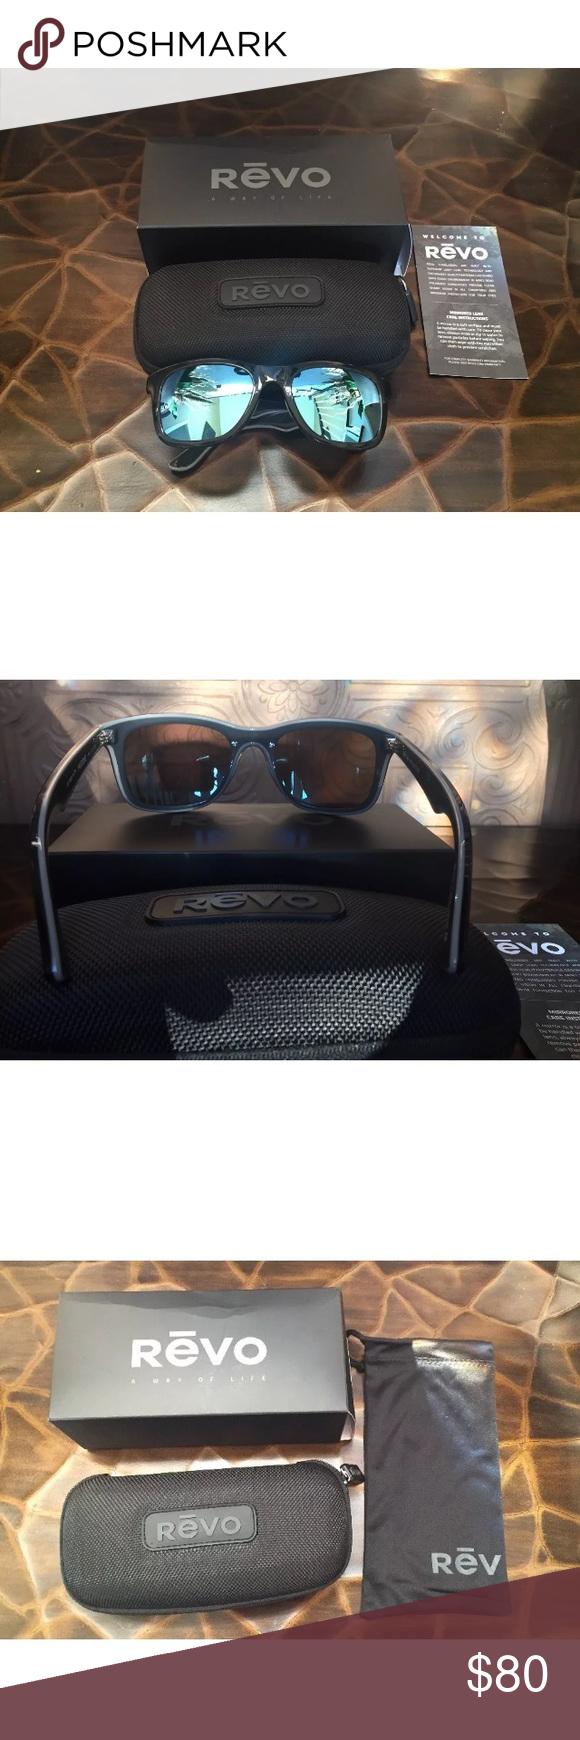 b4b030a3ac NEW REVO Huddie Polarized Sunglasses W  Case REVO Huddie Model RE 1000  polarized sunglasses.